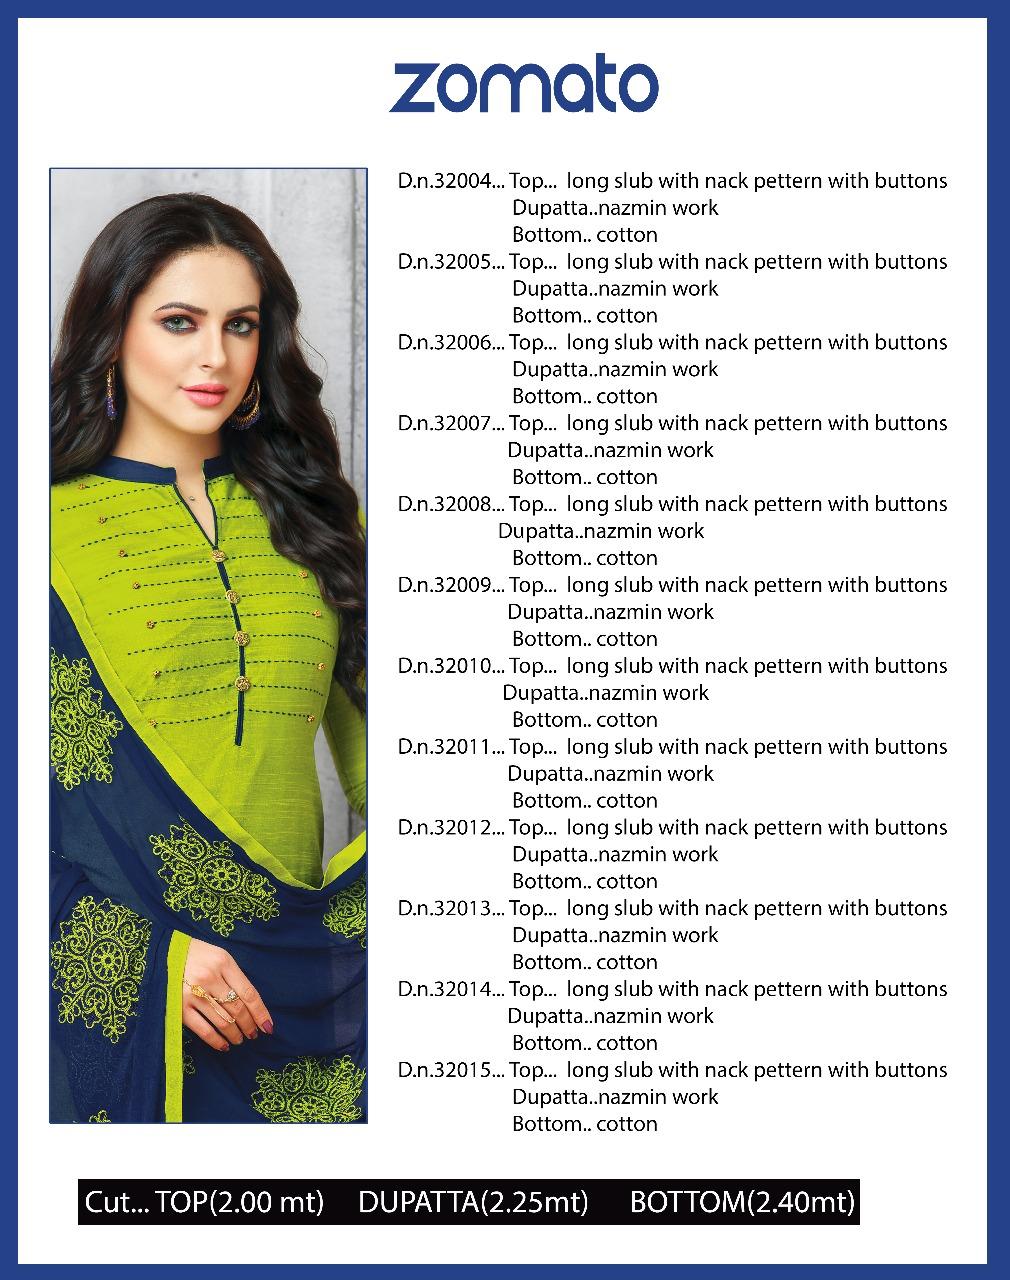 Kapil Trendz Zomato Salwar Suit Wholesale Catalog 12 Pcs 13 - Kapil Trendz Zomato Salwar Suit Wholesale Catalog 12 Pcs